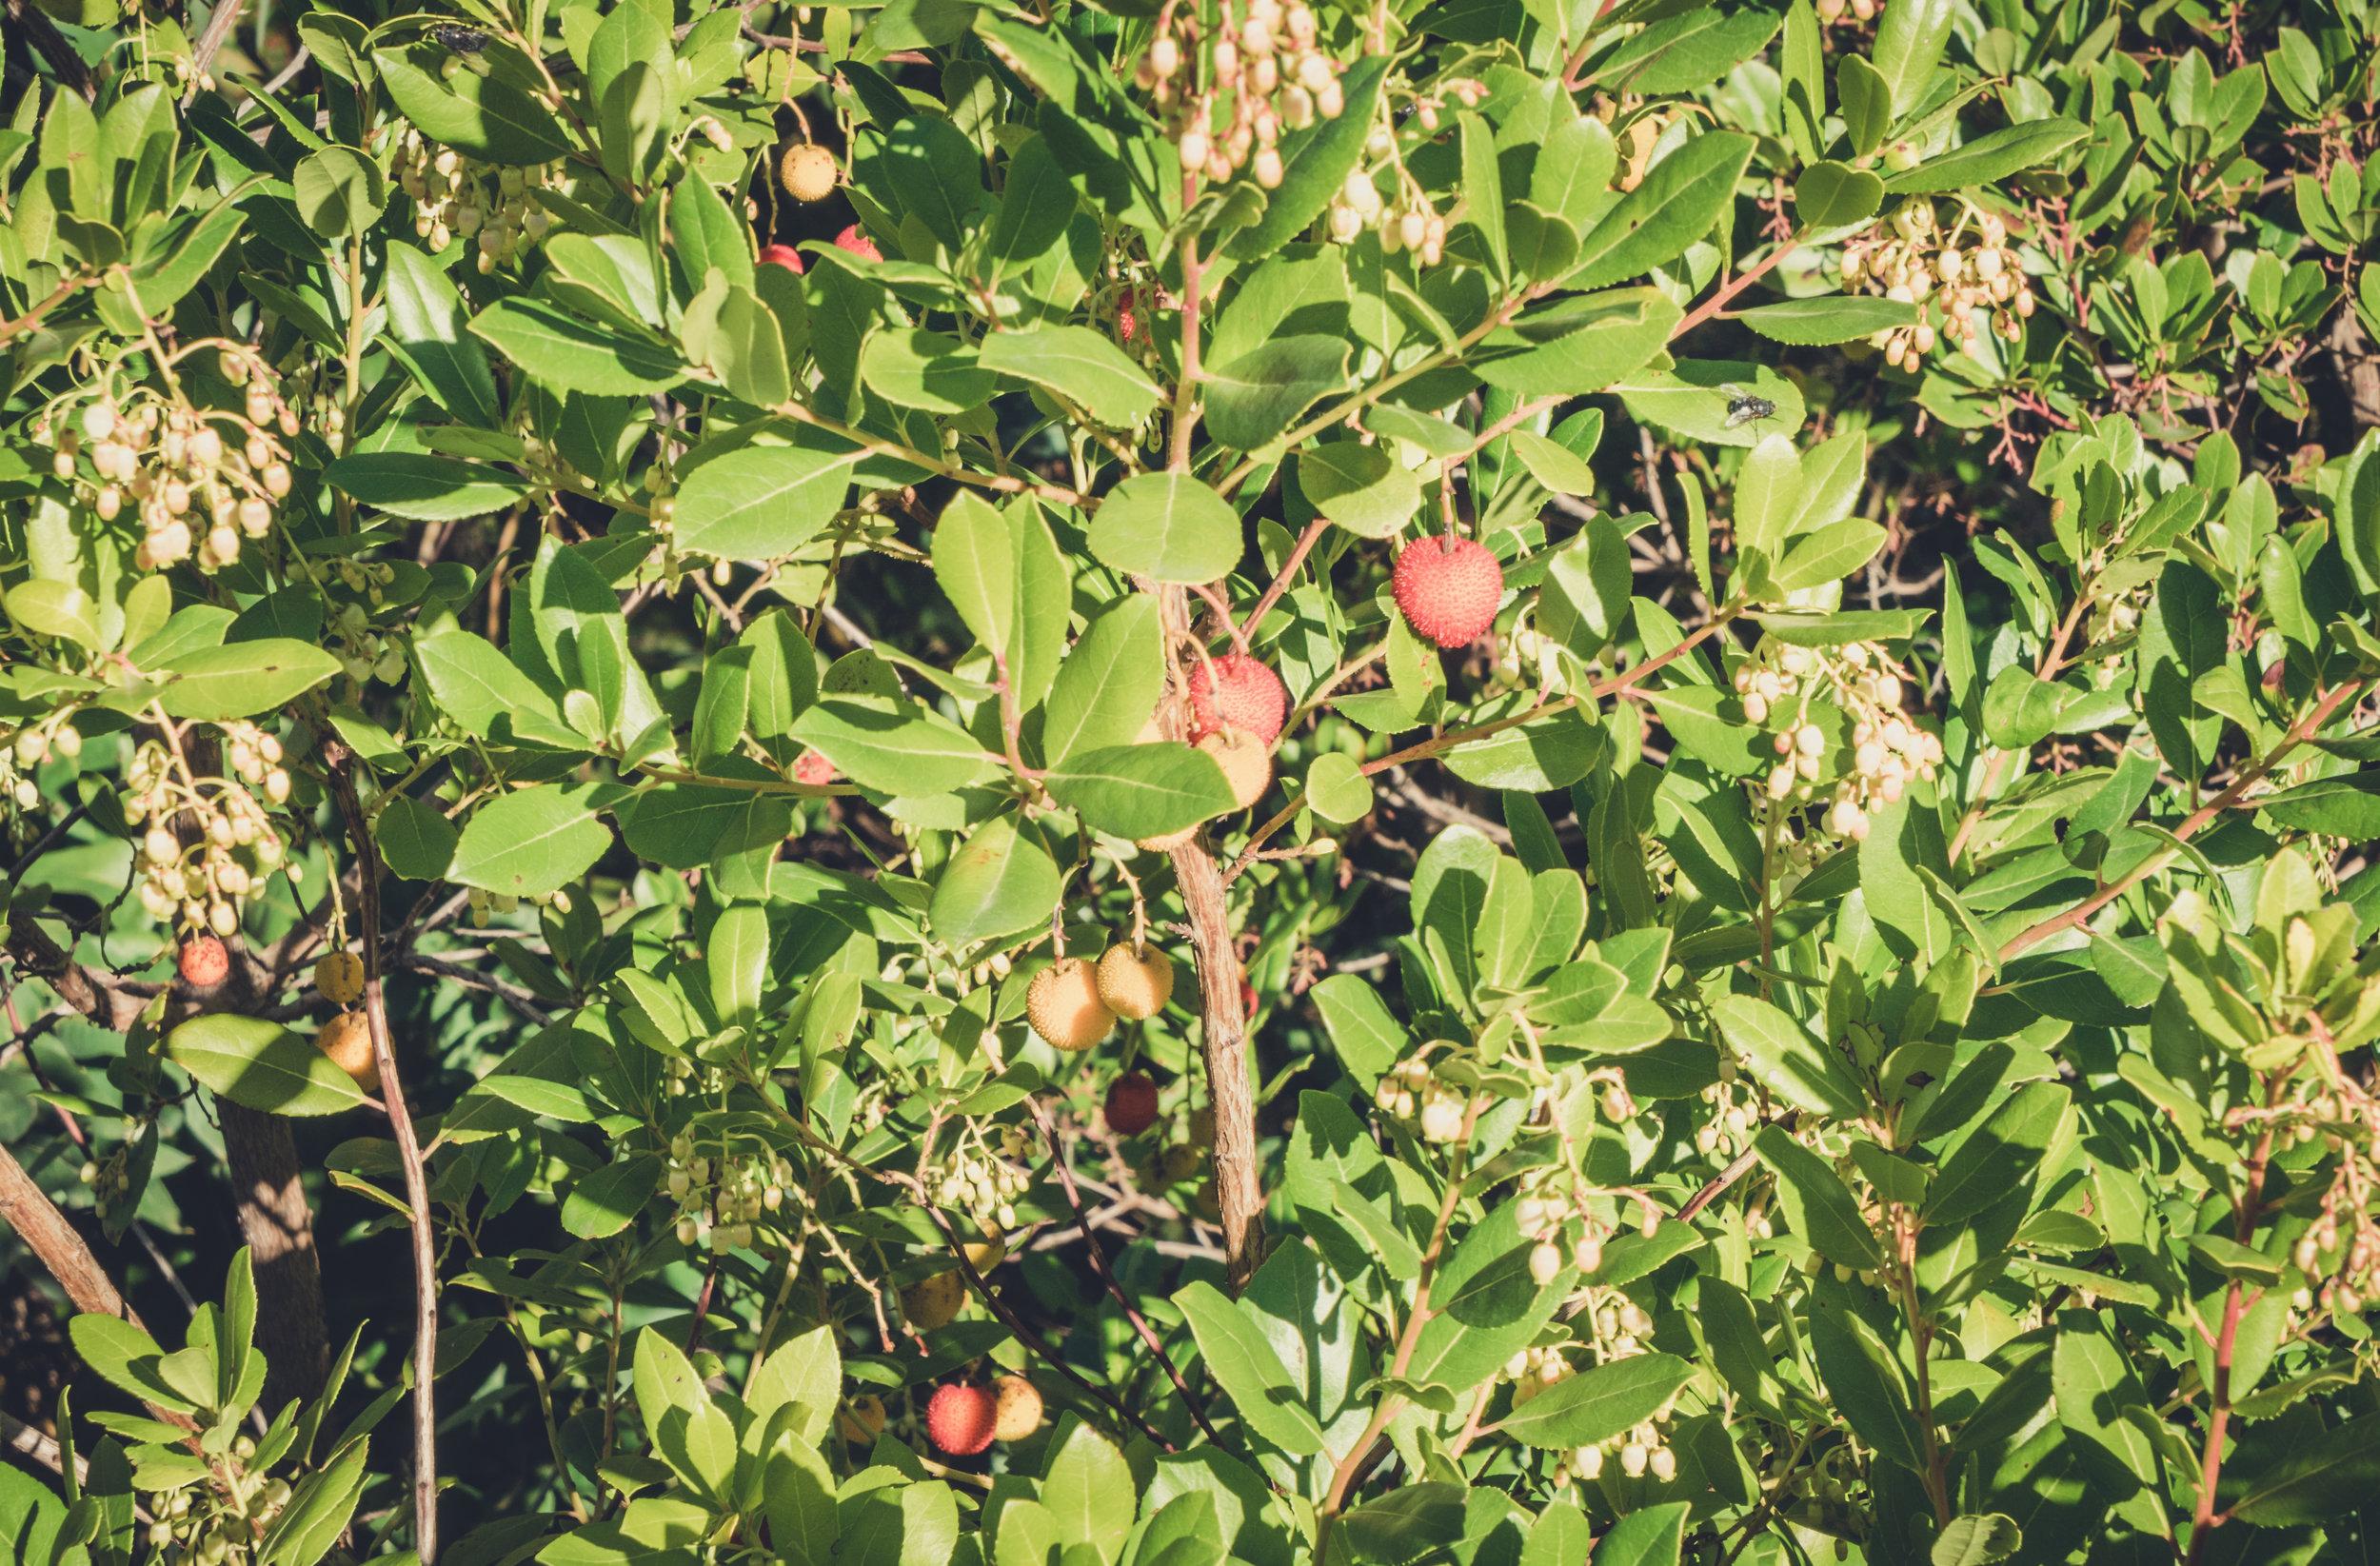 monchique portugal. roadside fruit monchique. stopping to see the fruit. monchique hills.jpg